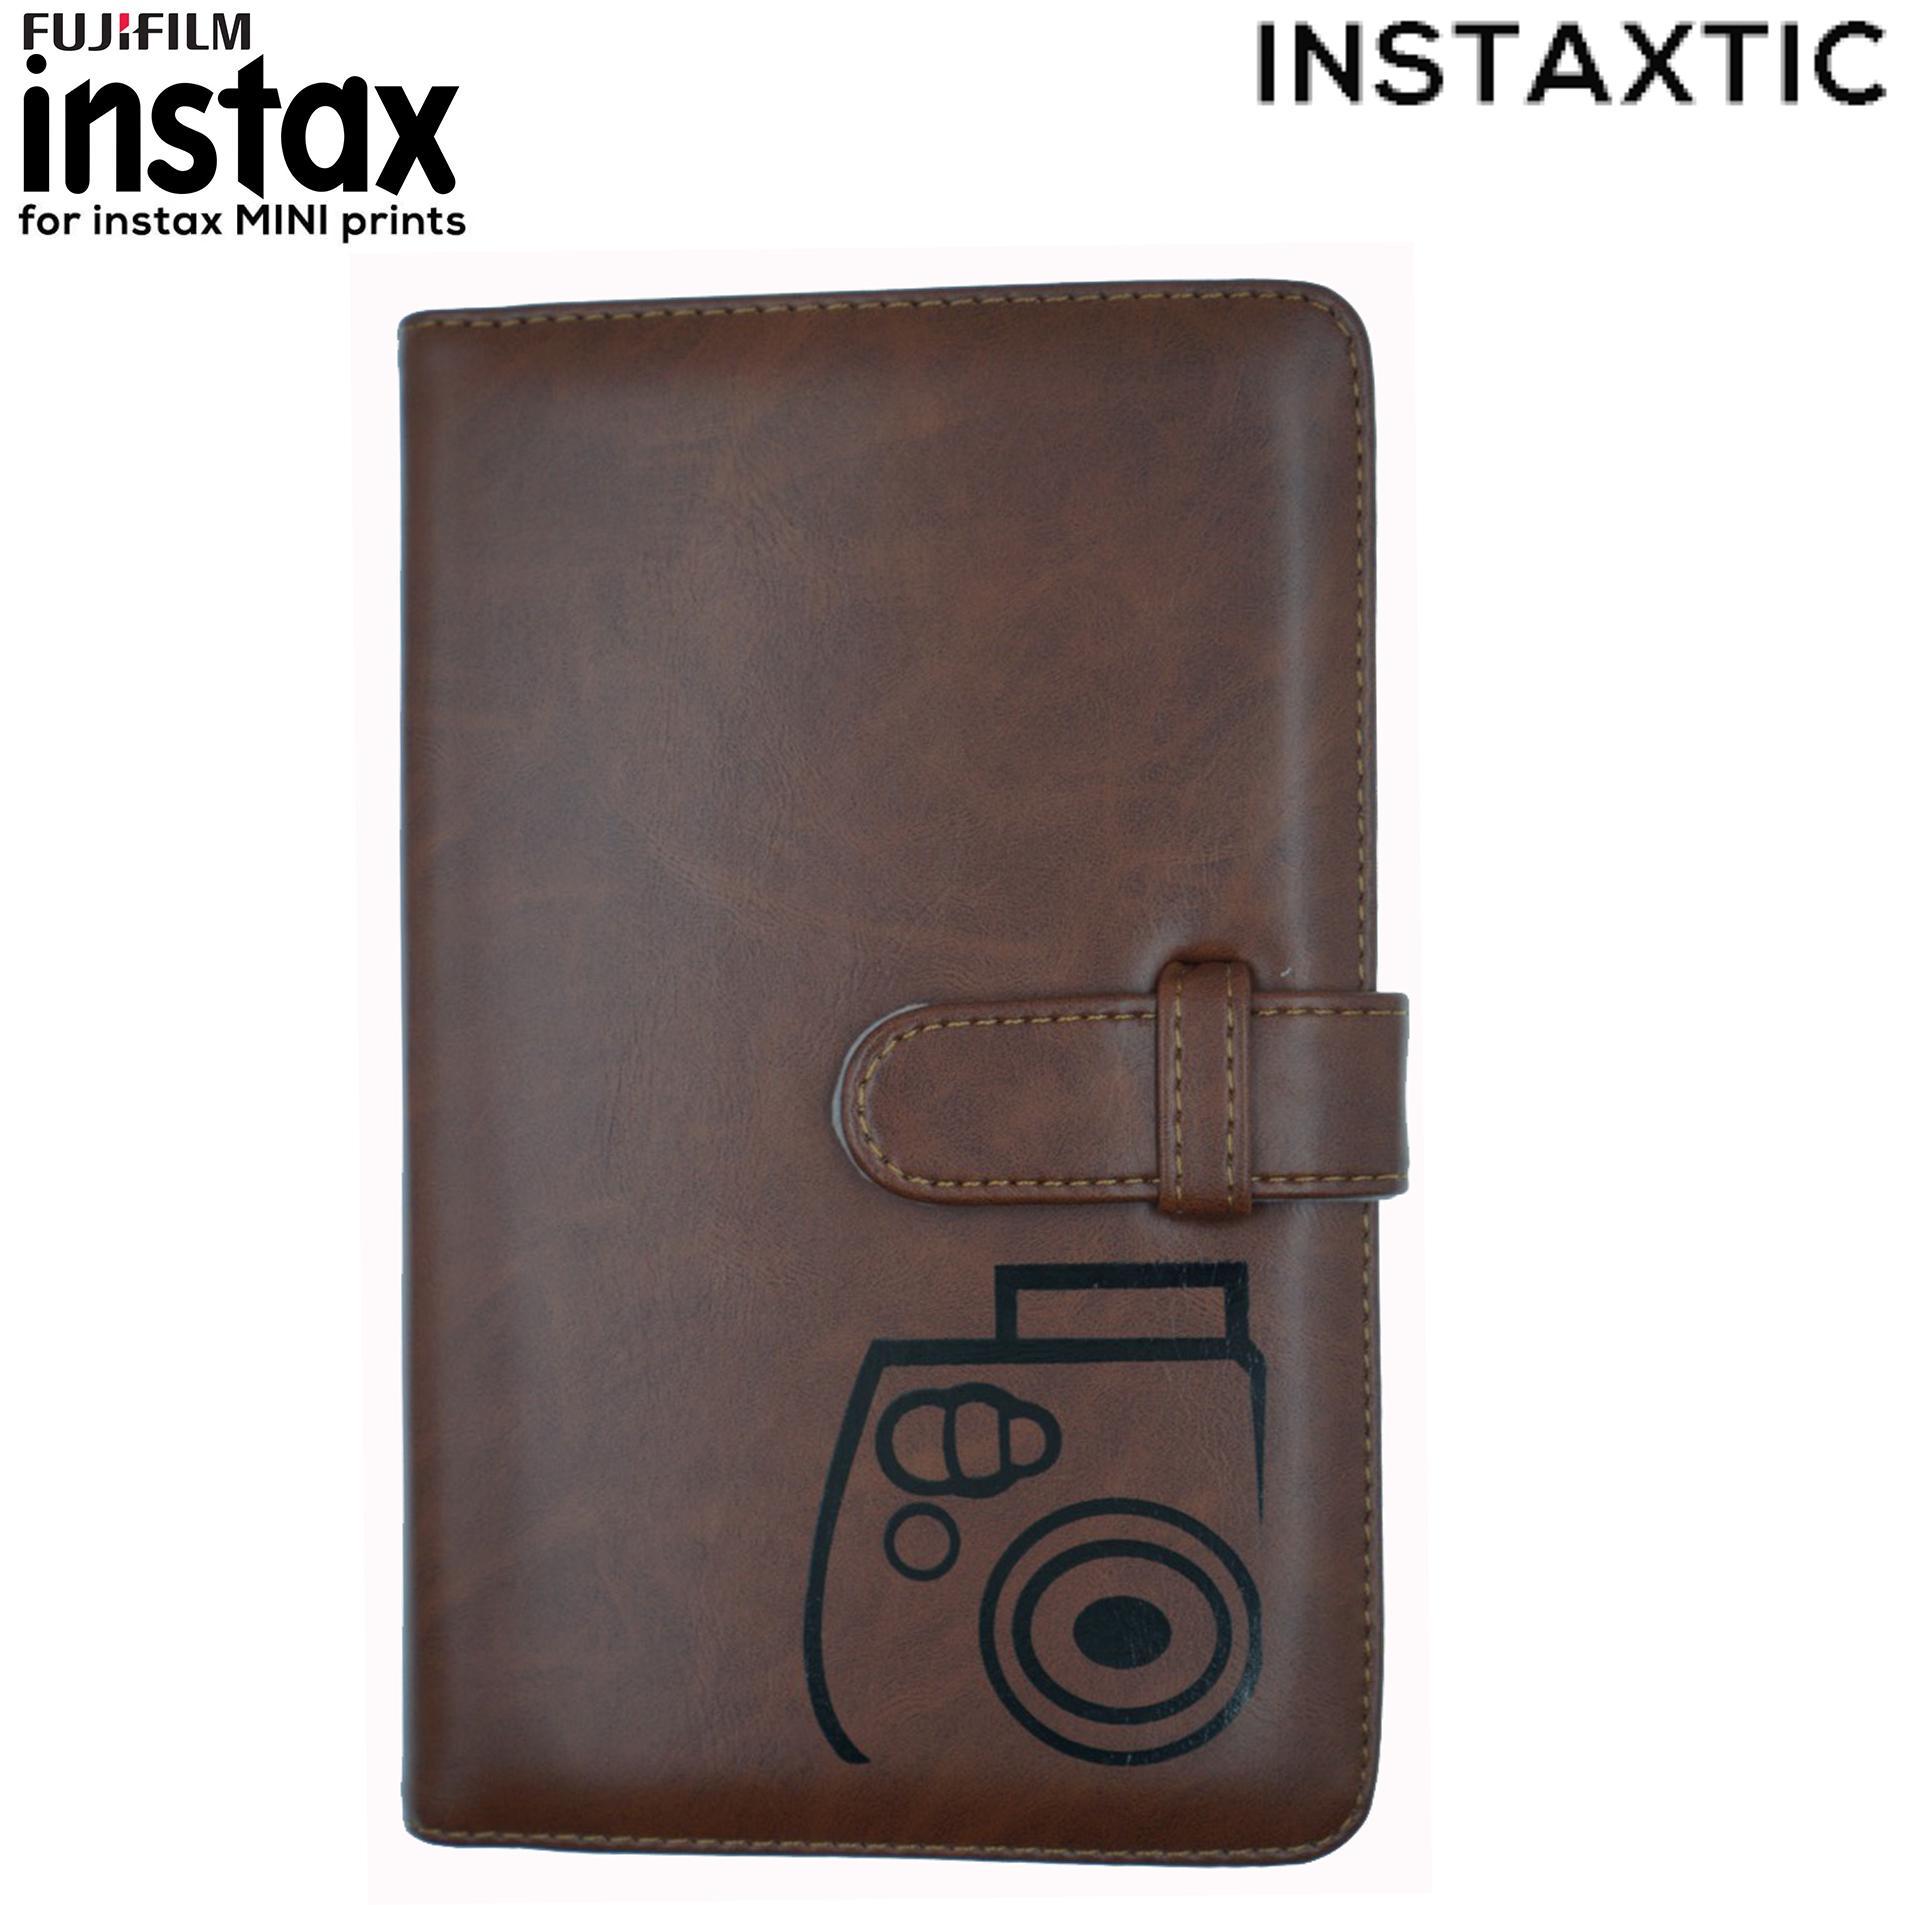 Instaxtic Fujifilm Instax Mini 96 Slots Printed Leather Album By Instaxtic.